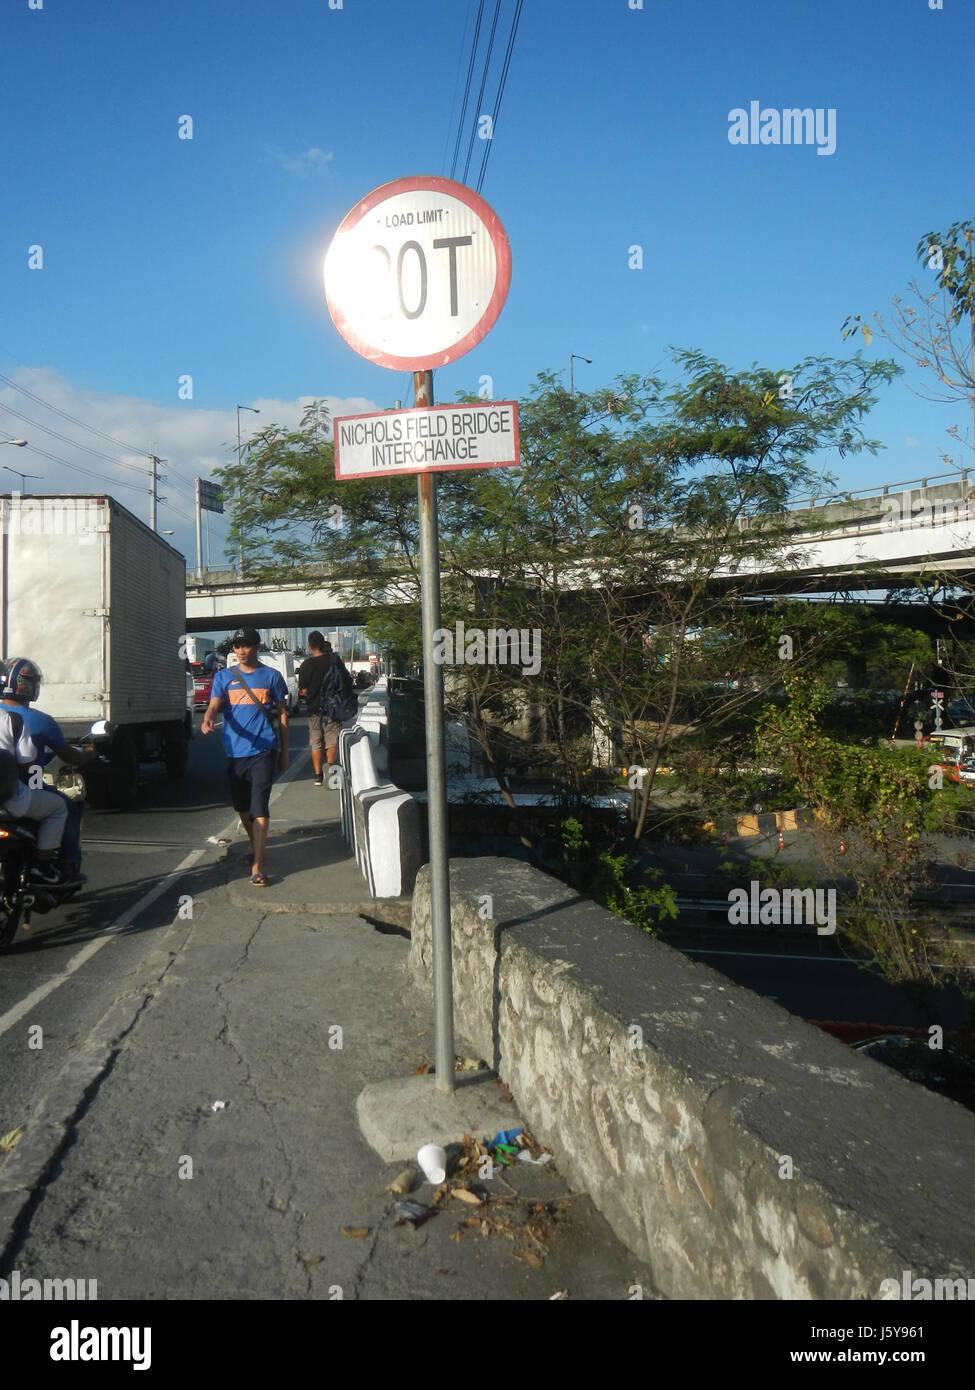 04376 Sales Interchange Taguig Pasay City  09 - Stock Image